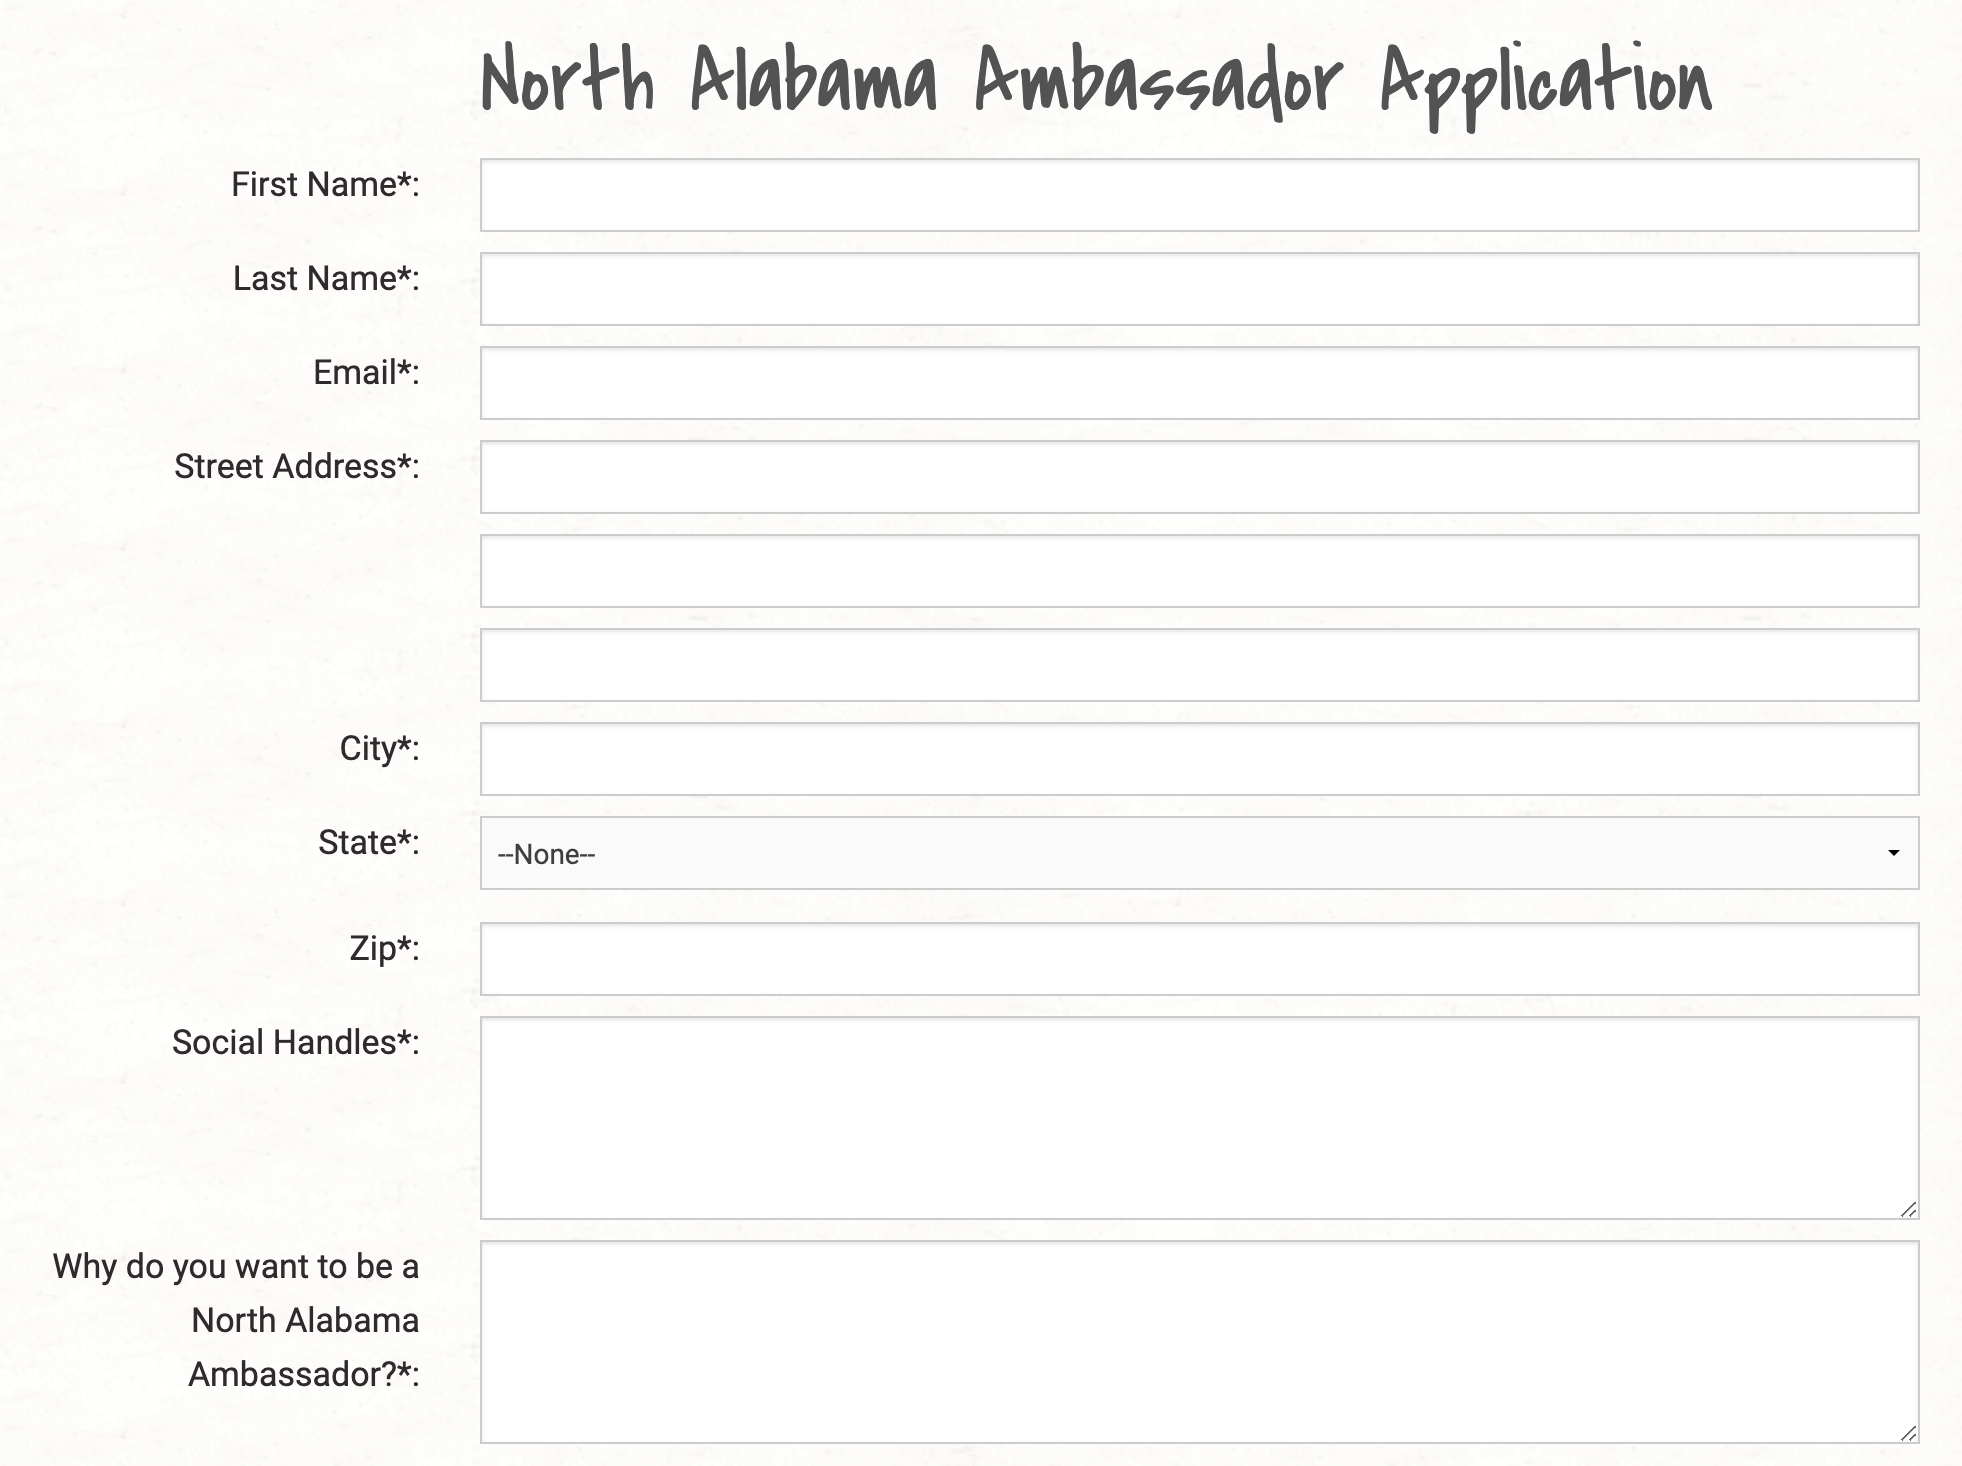 North Alabama Tourism Ambassador Program Application example.